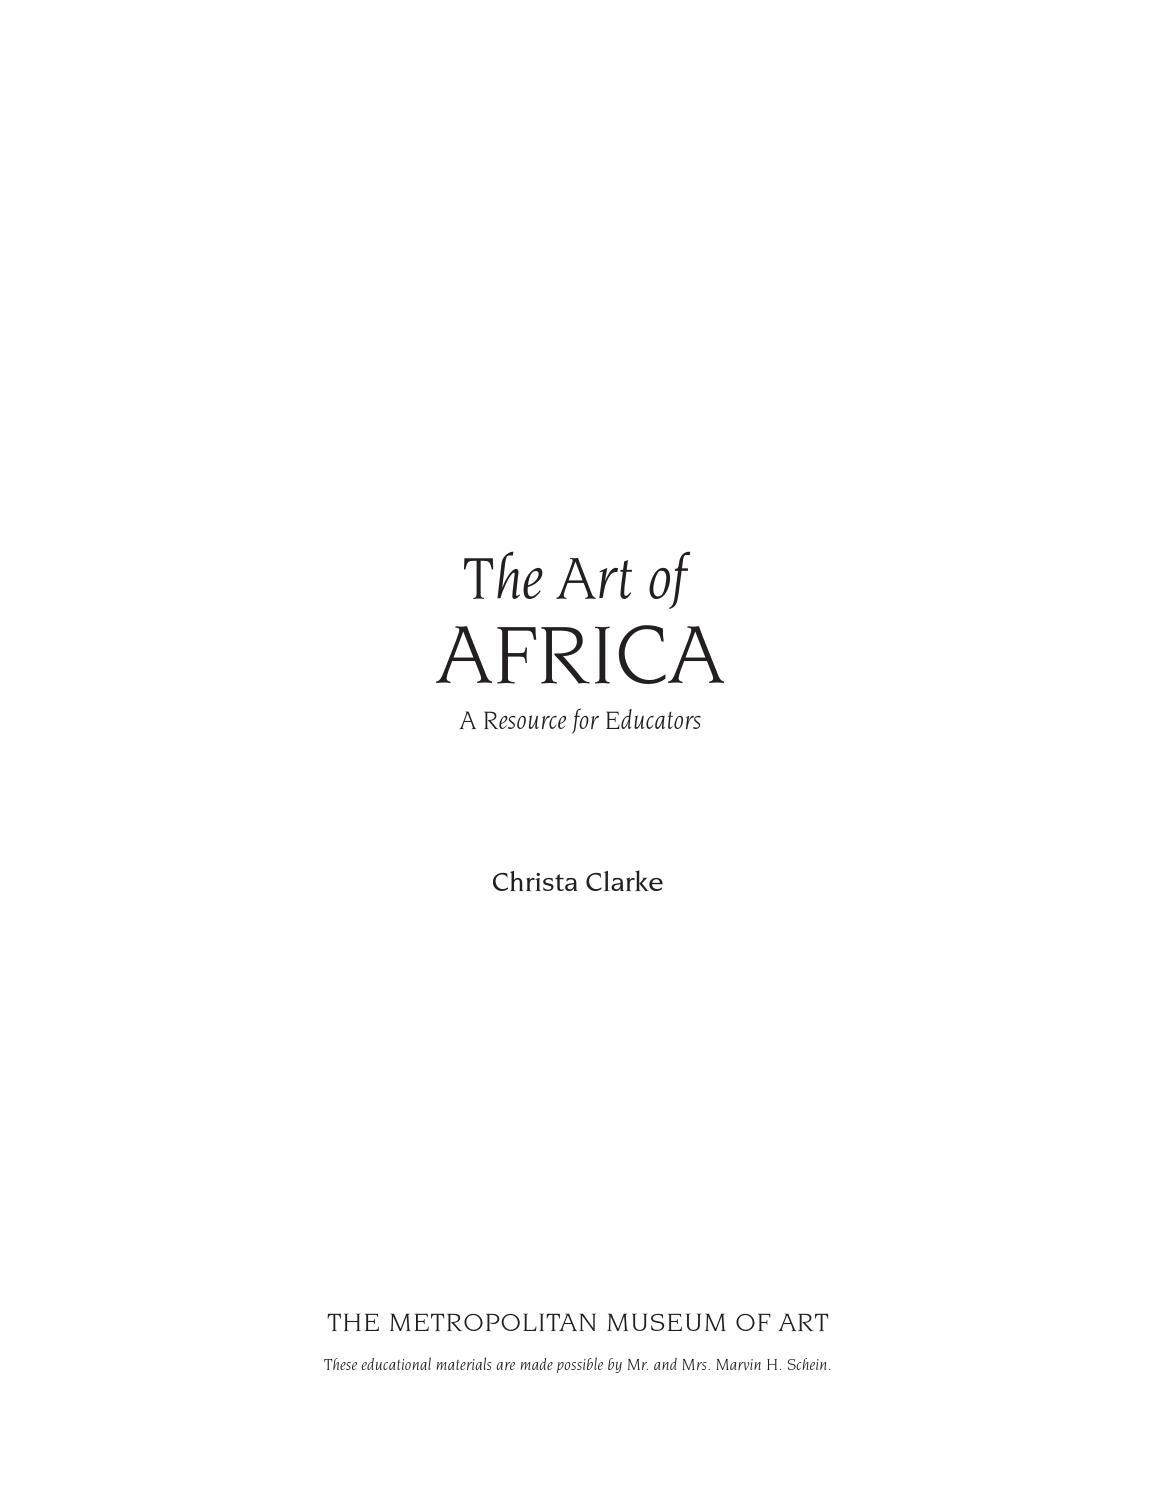 The art of africa a resource for educators by gaetan verdier issuu buycottarizona